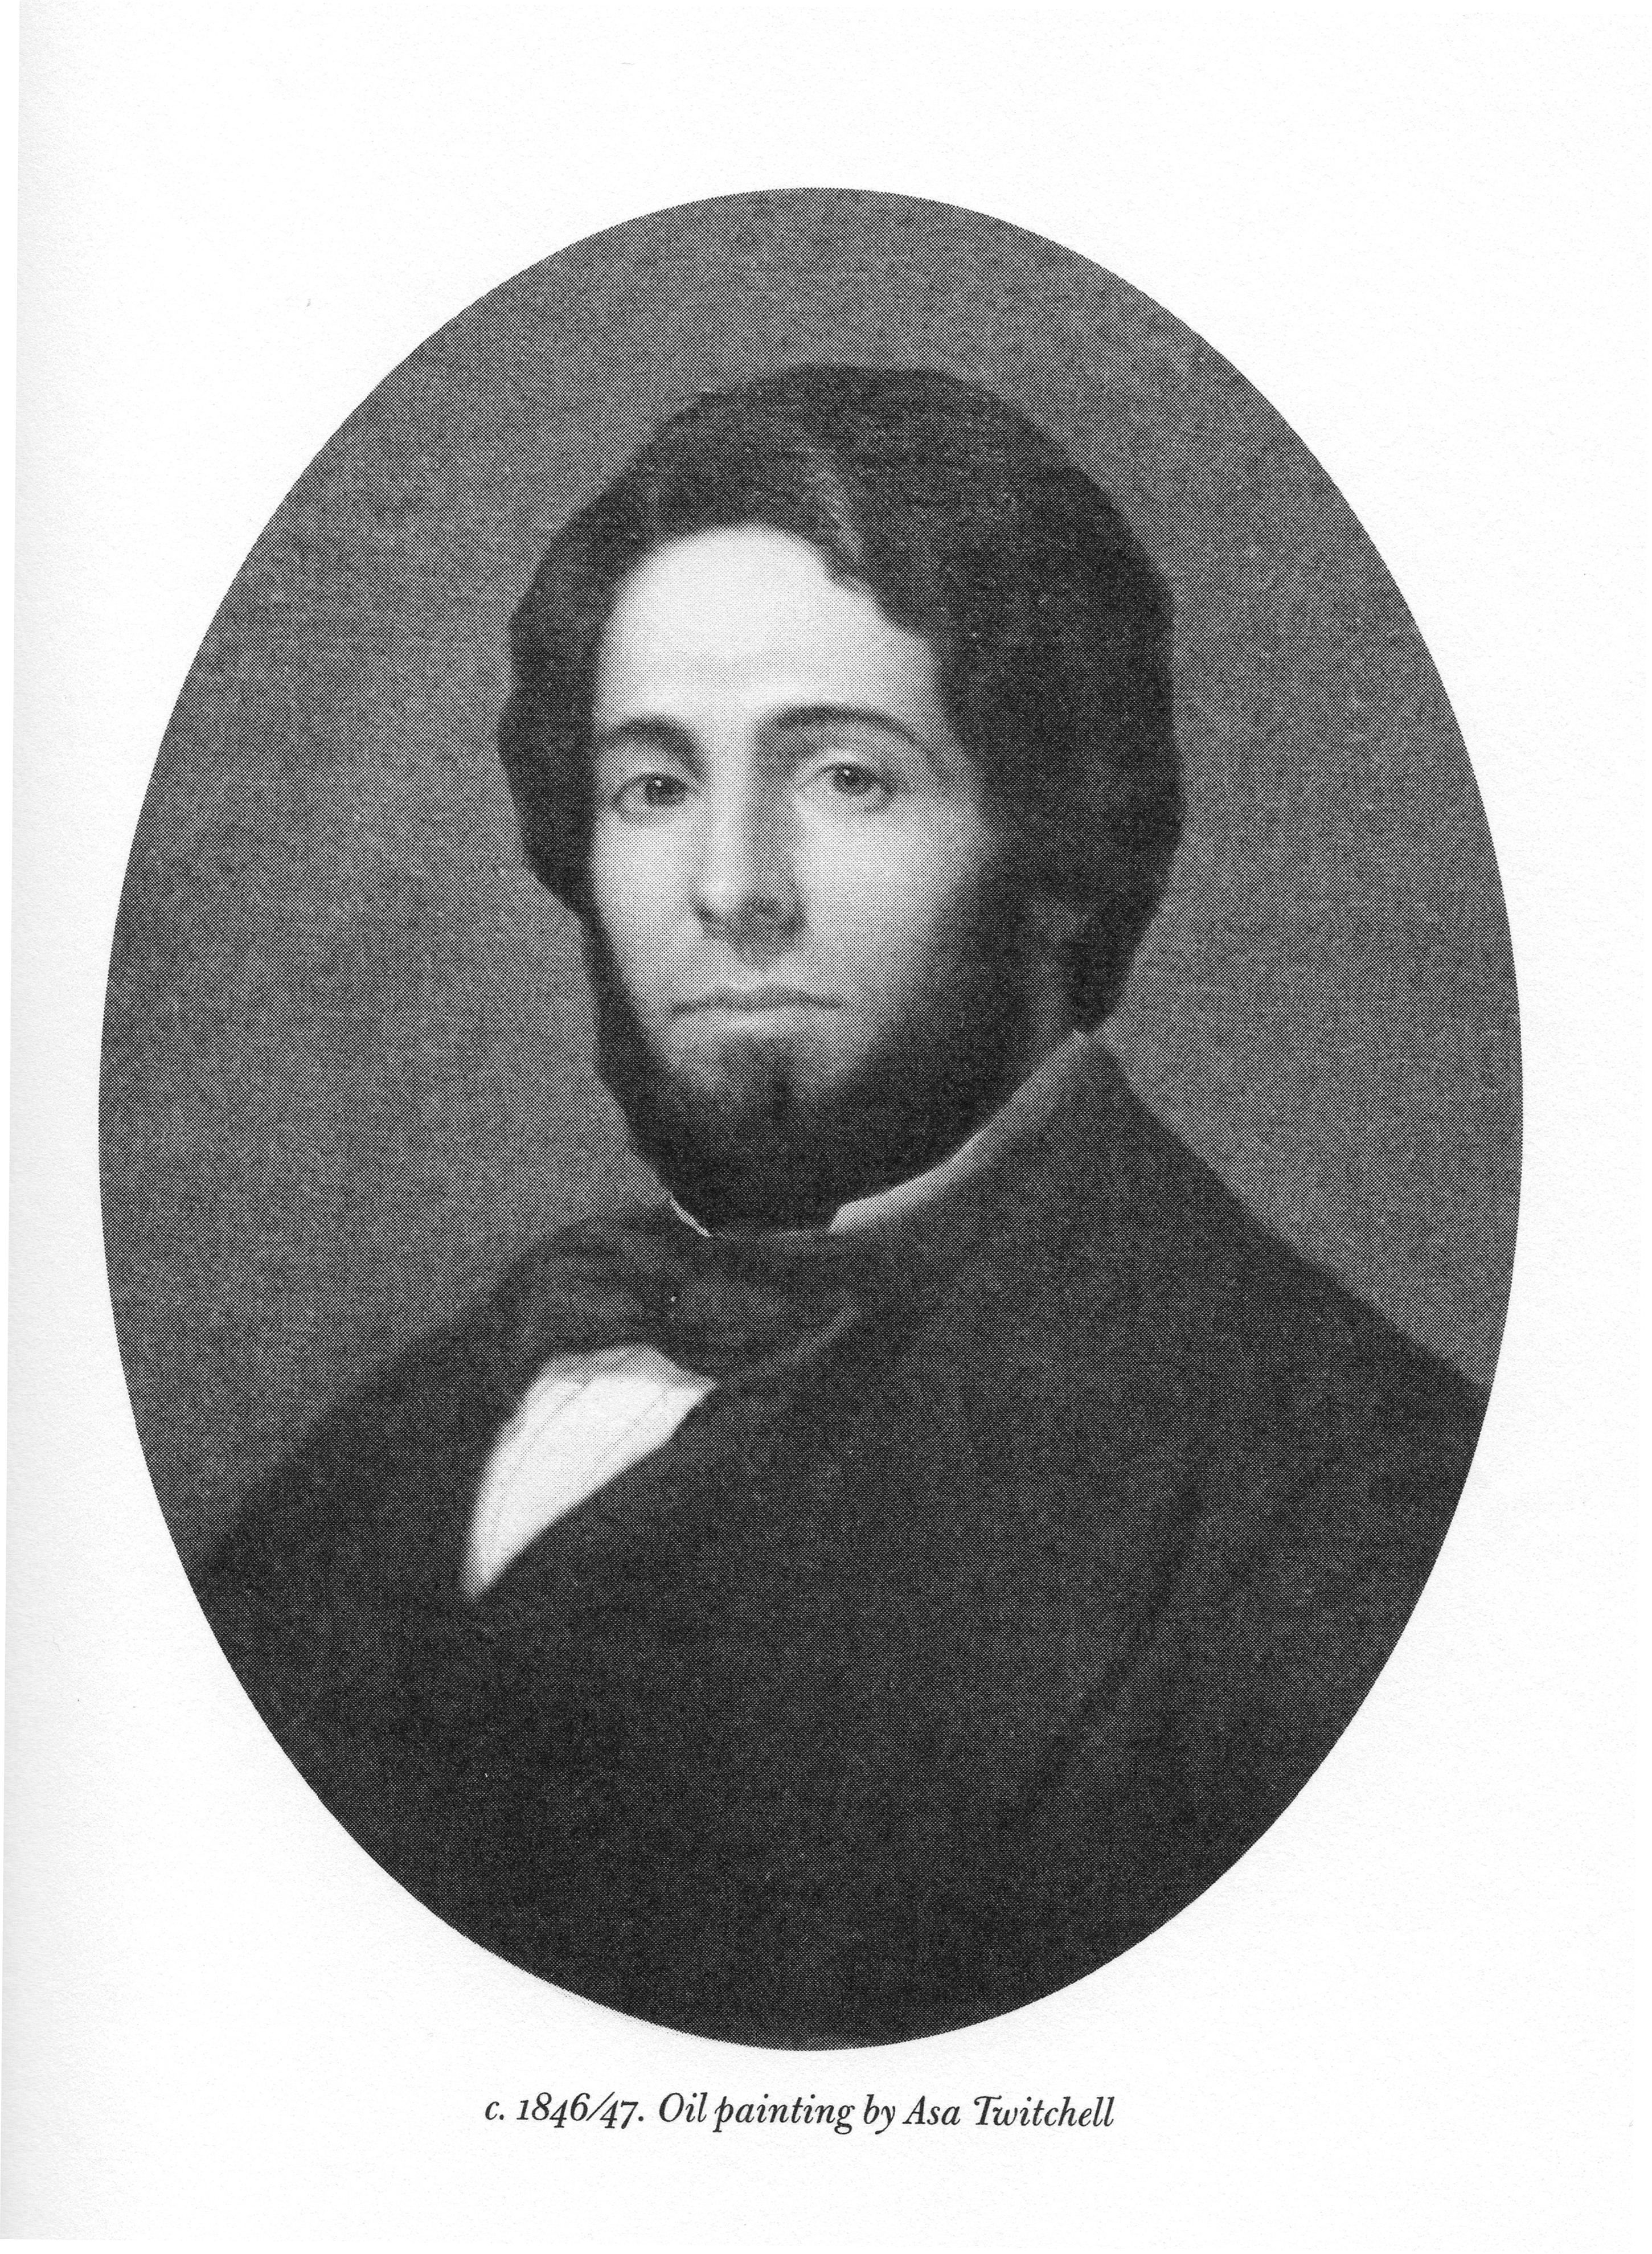 a biography of american novelist herman melville William v herman melville and the american novels of herman melville as david kirby author of a biography titled herman melville.